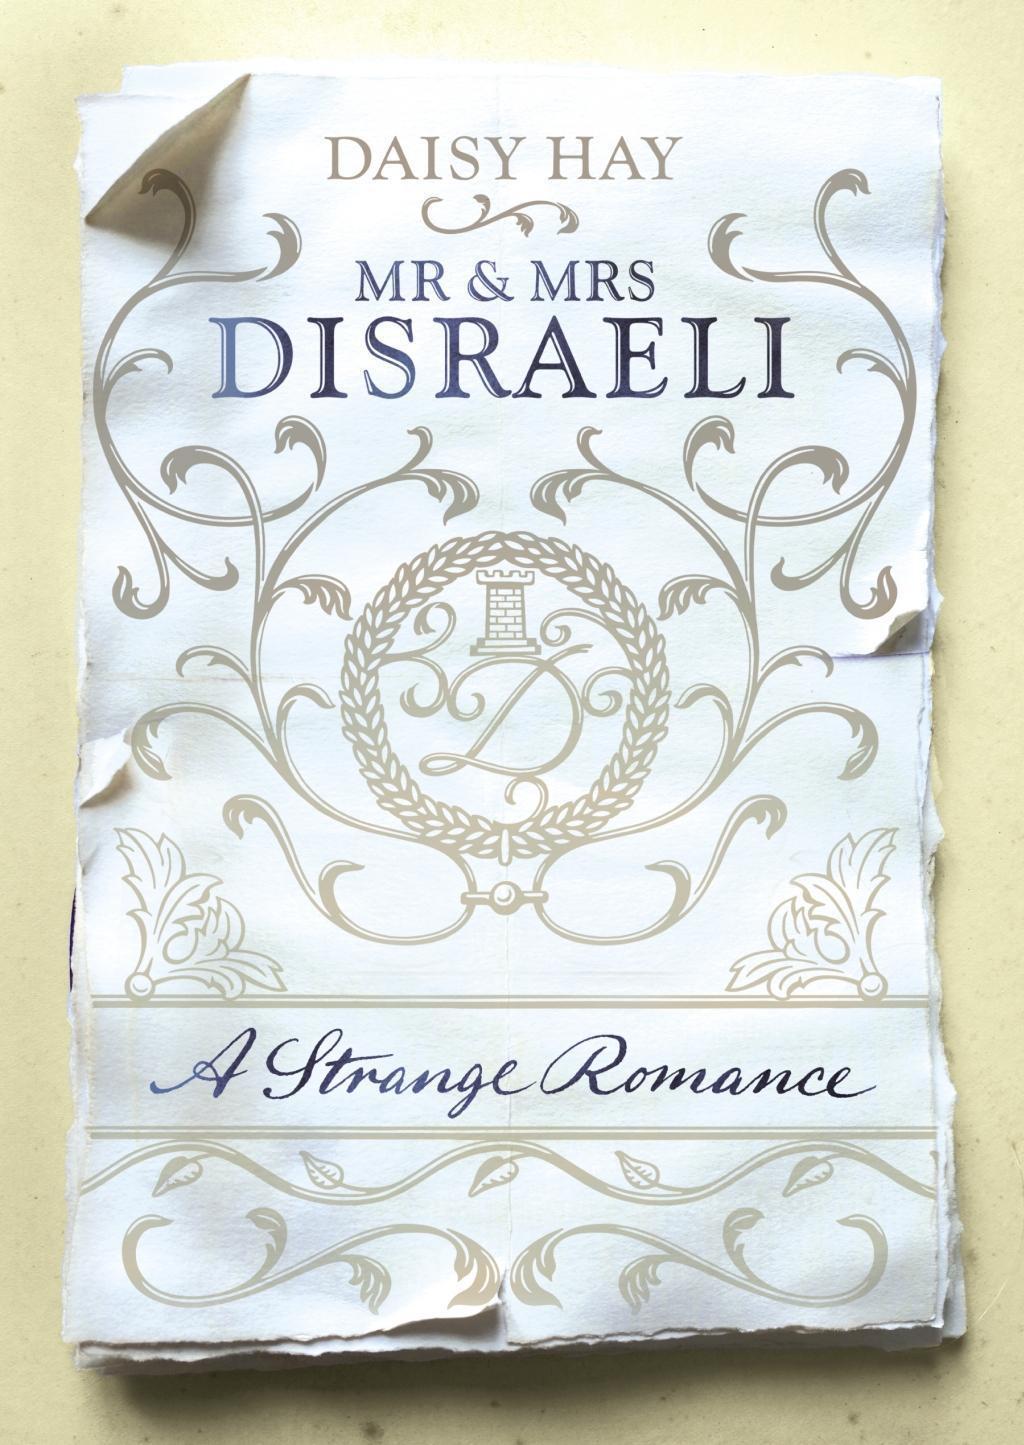 Mr and Mrs Disraeli